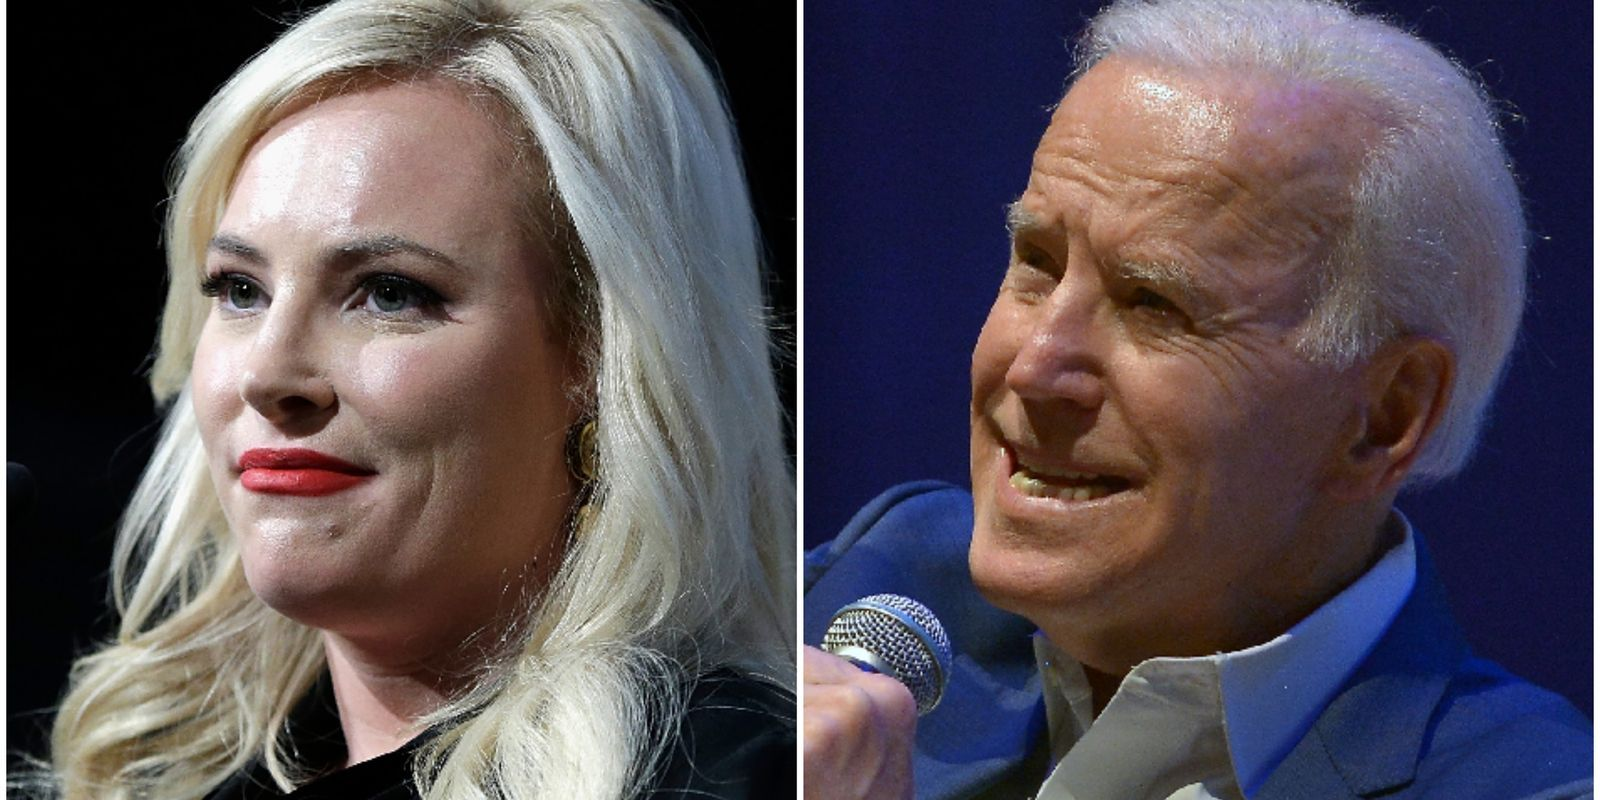 Joe Biden tells Meghan McCain, 'If anyone can make it, your dad can'